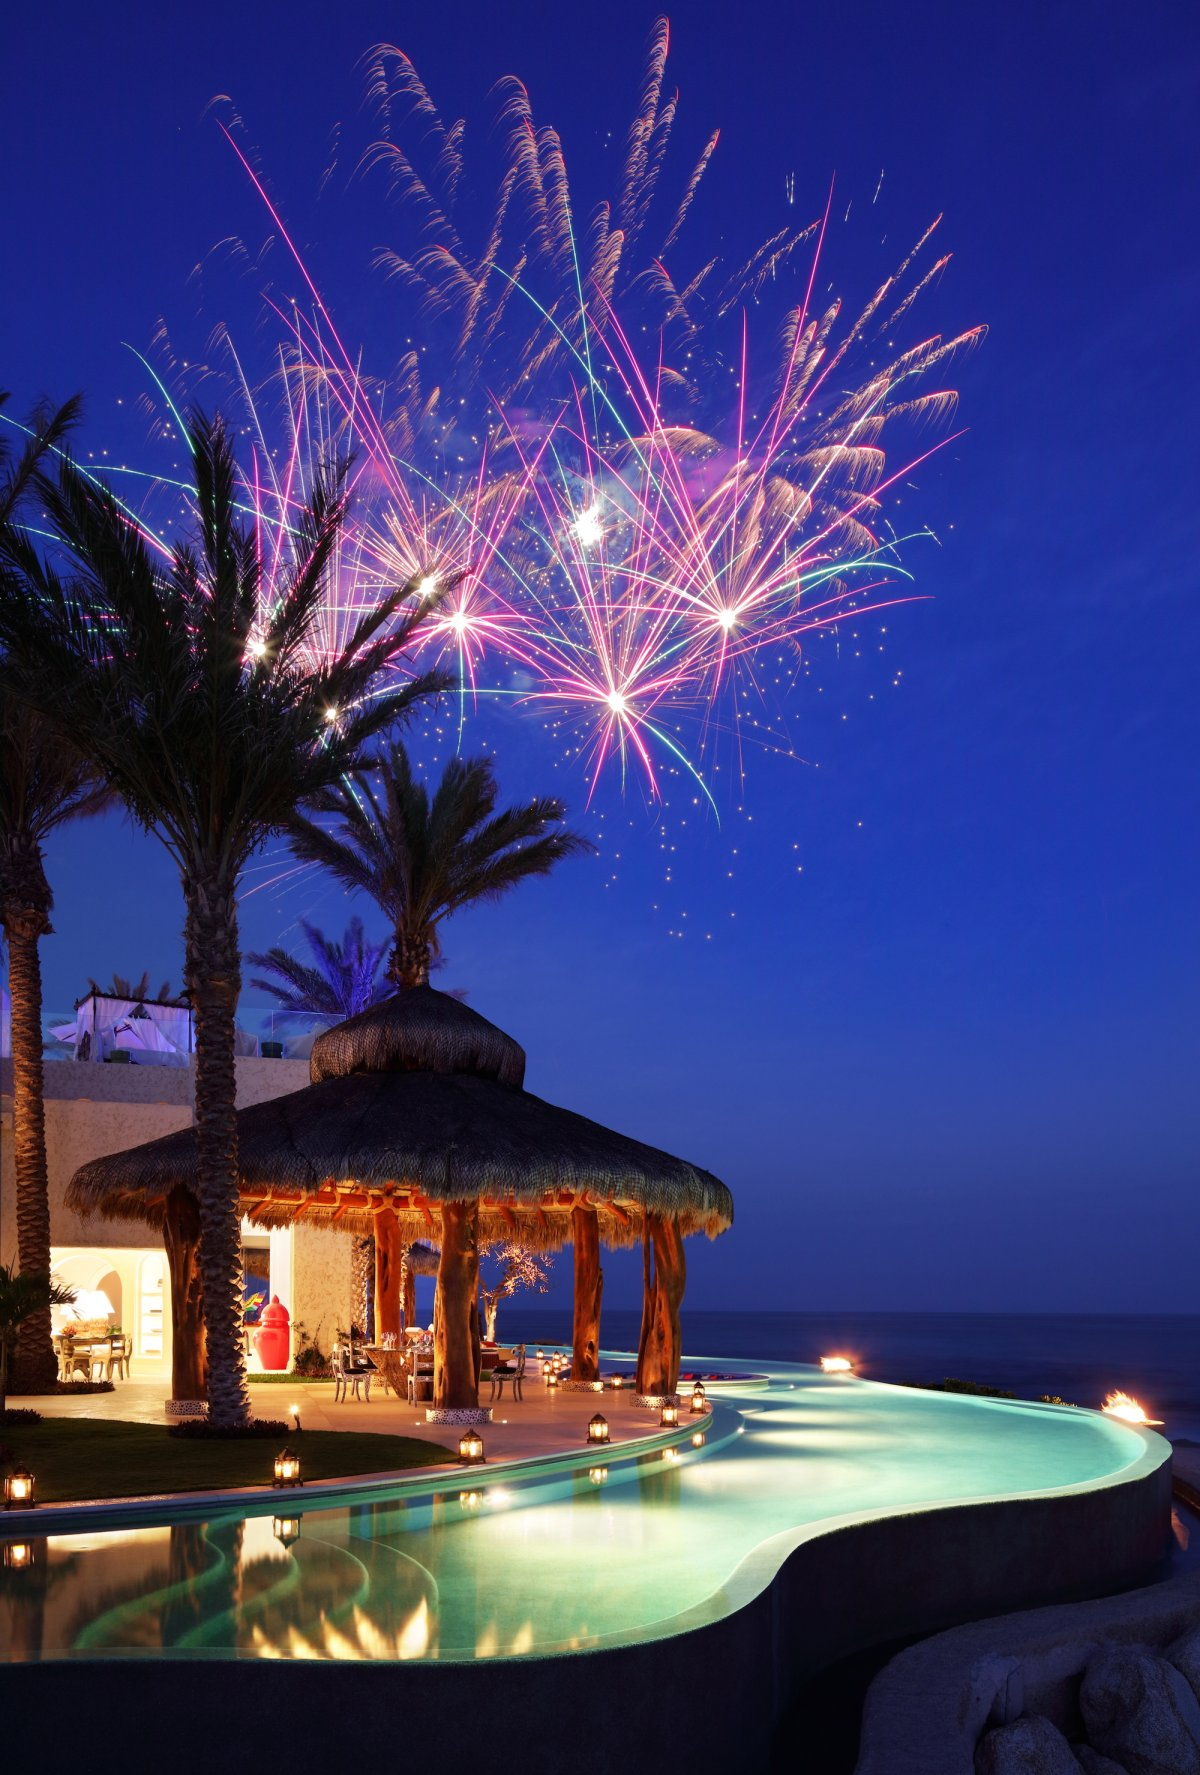 14-hotel-mansao-mexico-ty-warner-mansion